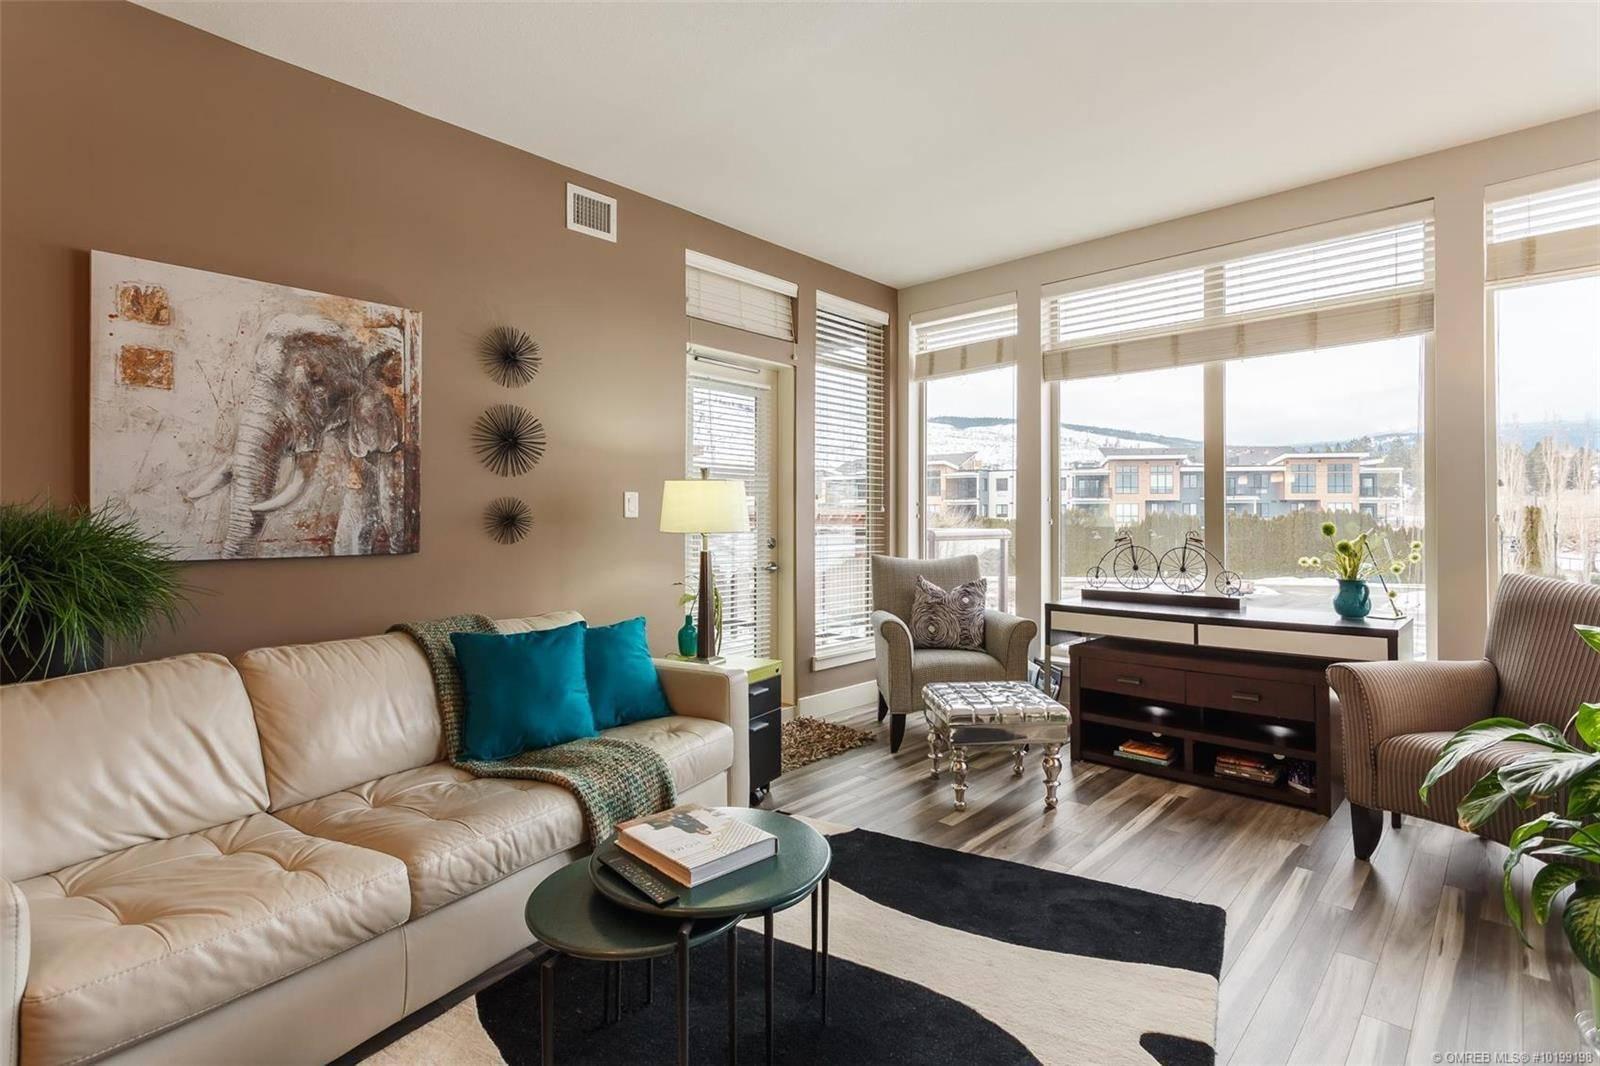 Condo for sale at 4205 Gellatly Rd Unit 202 West Kelowna British Columbia - MLS: 10199198